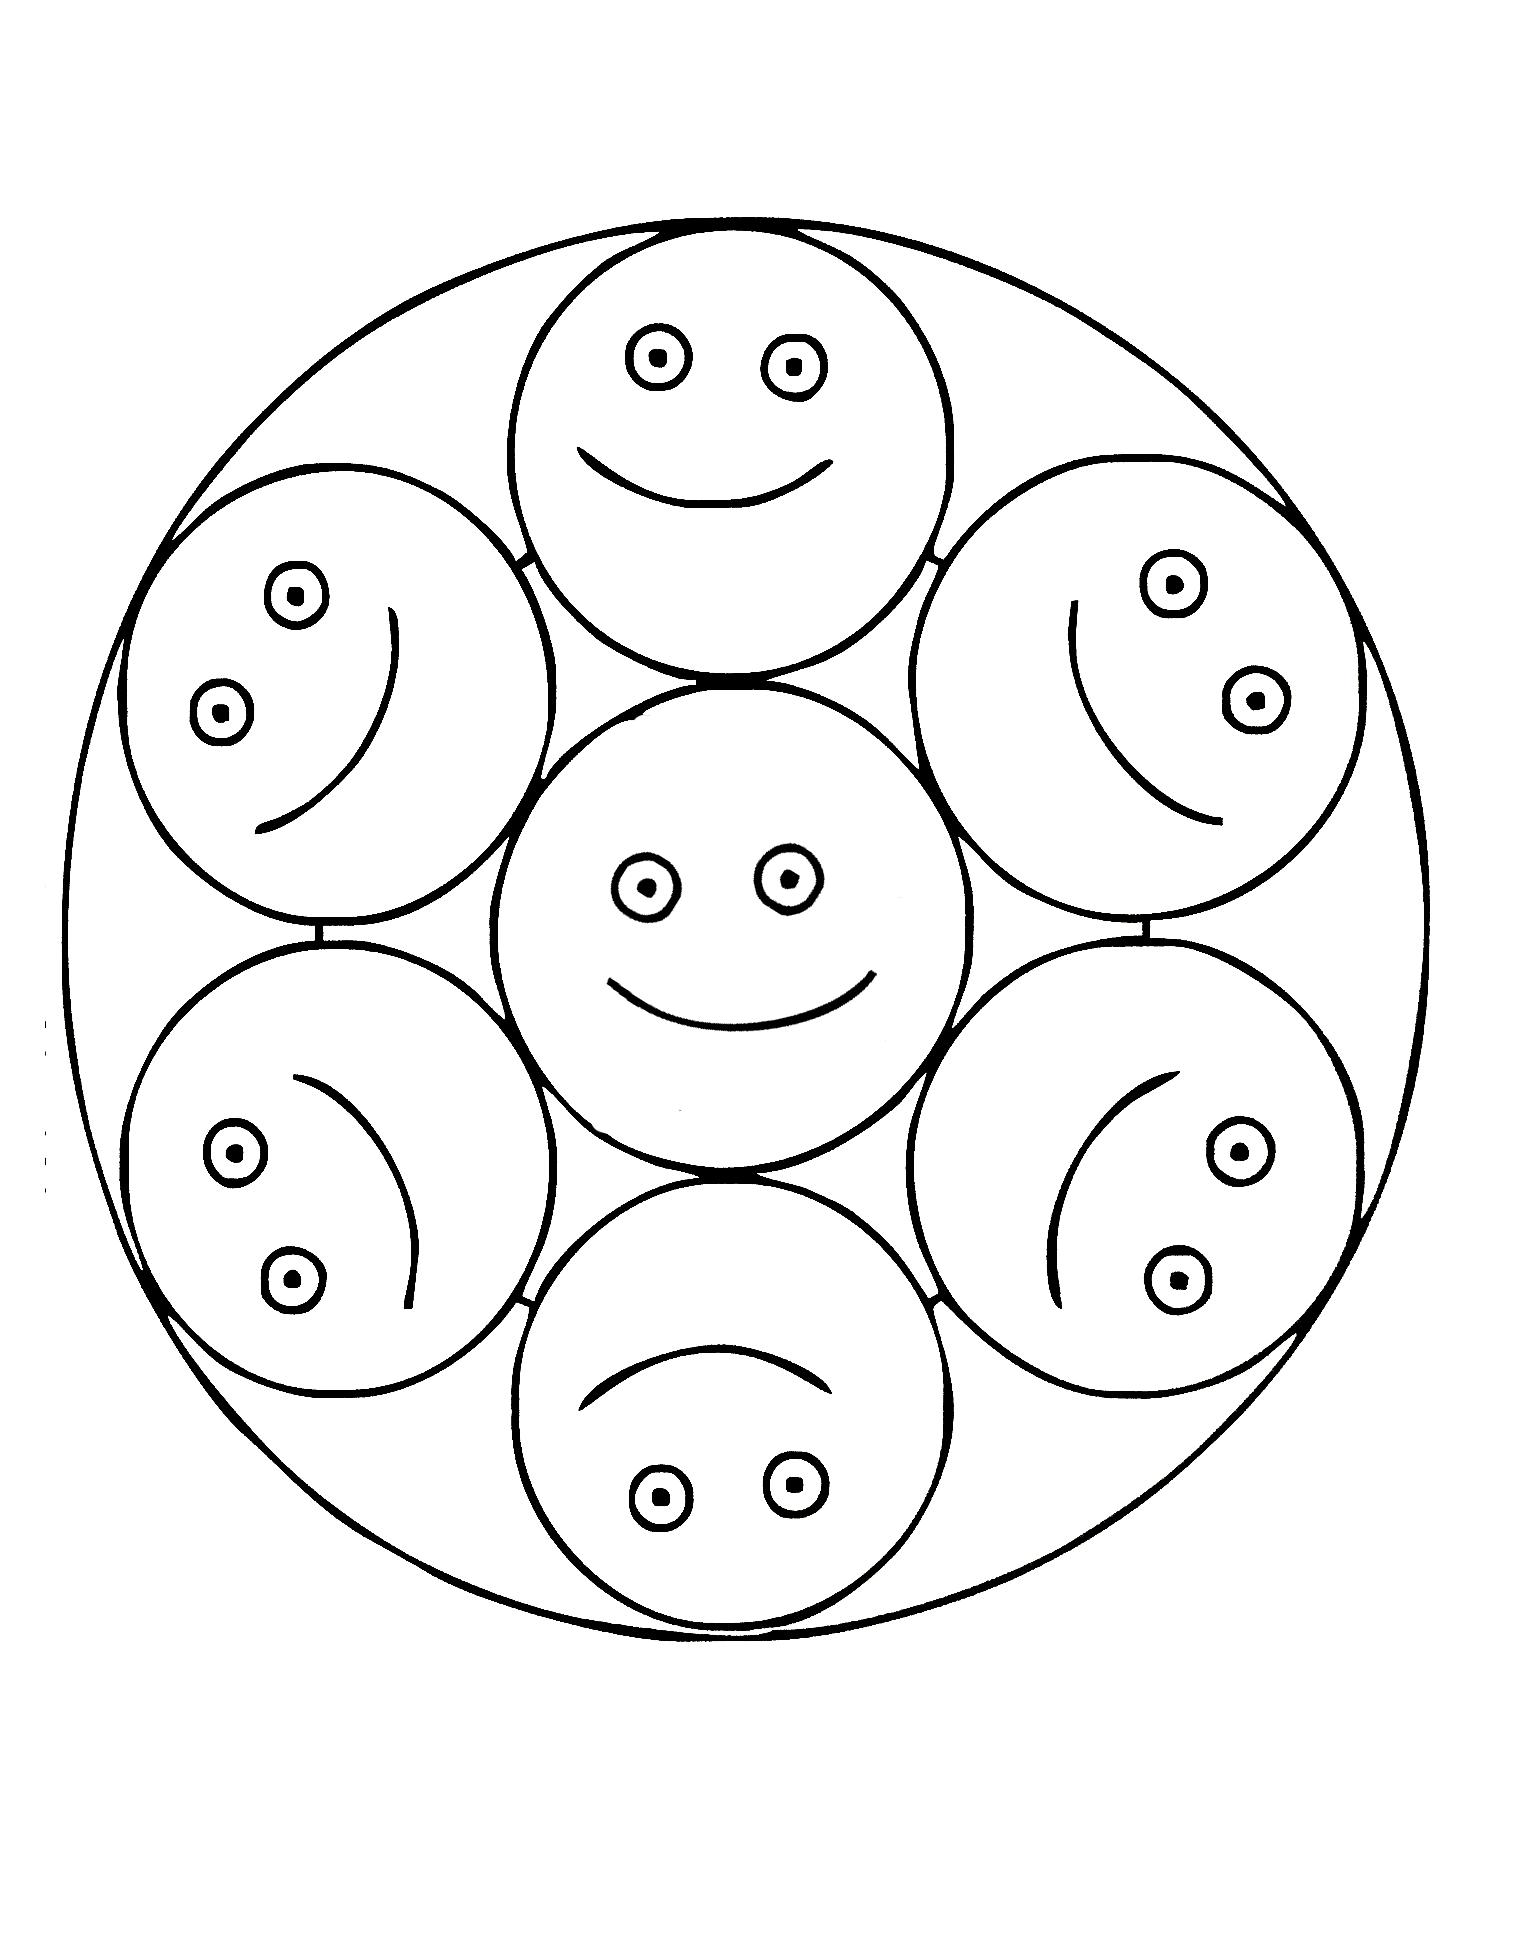 Mandala Smileys Mandalas Faciles Pour Enfants 100 Mandalas Zen Anti Stress